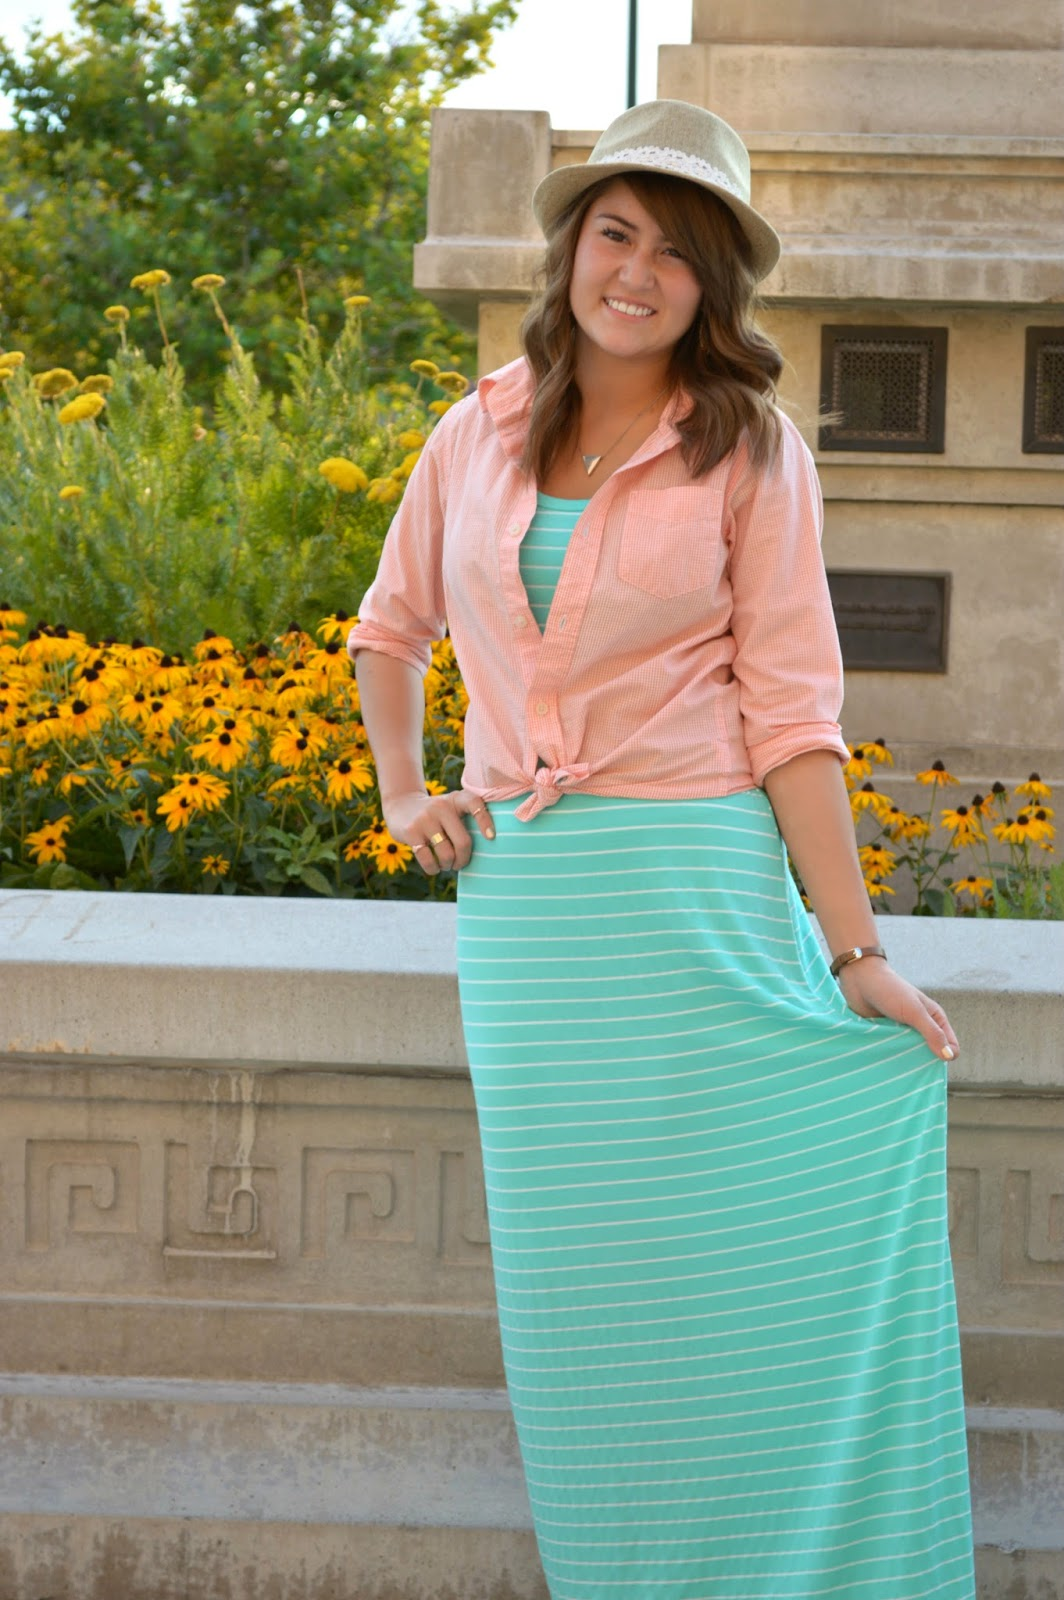 RACHEL SAYUMI | Fashion + Lifestyle Blog: August 2013